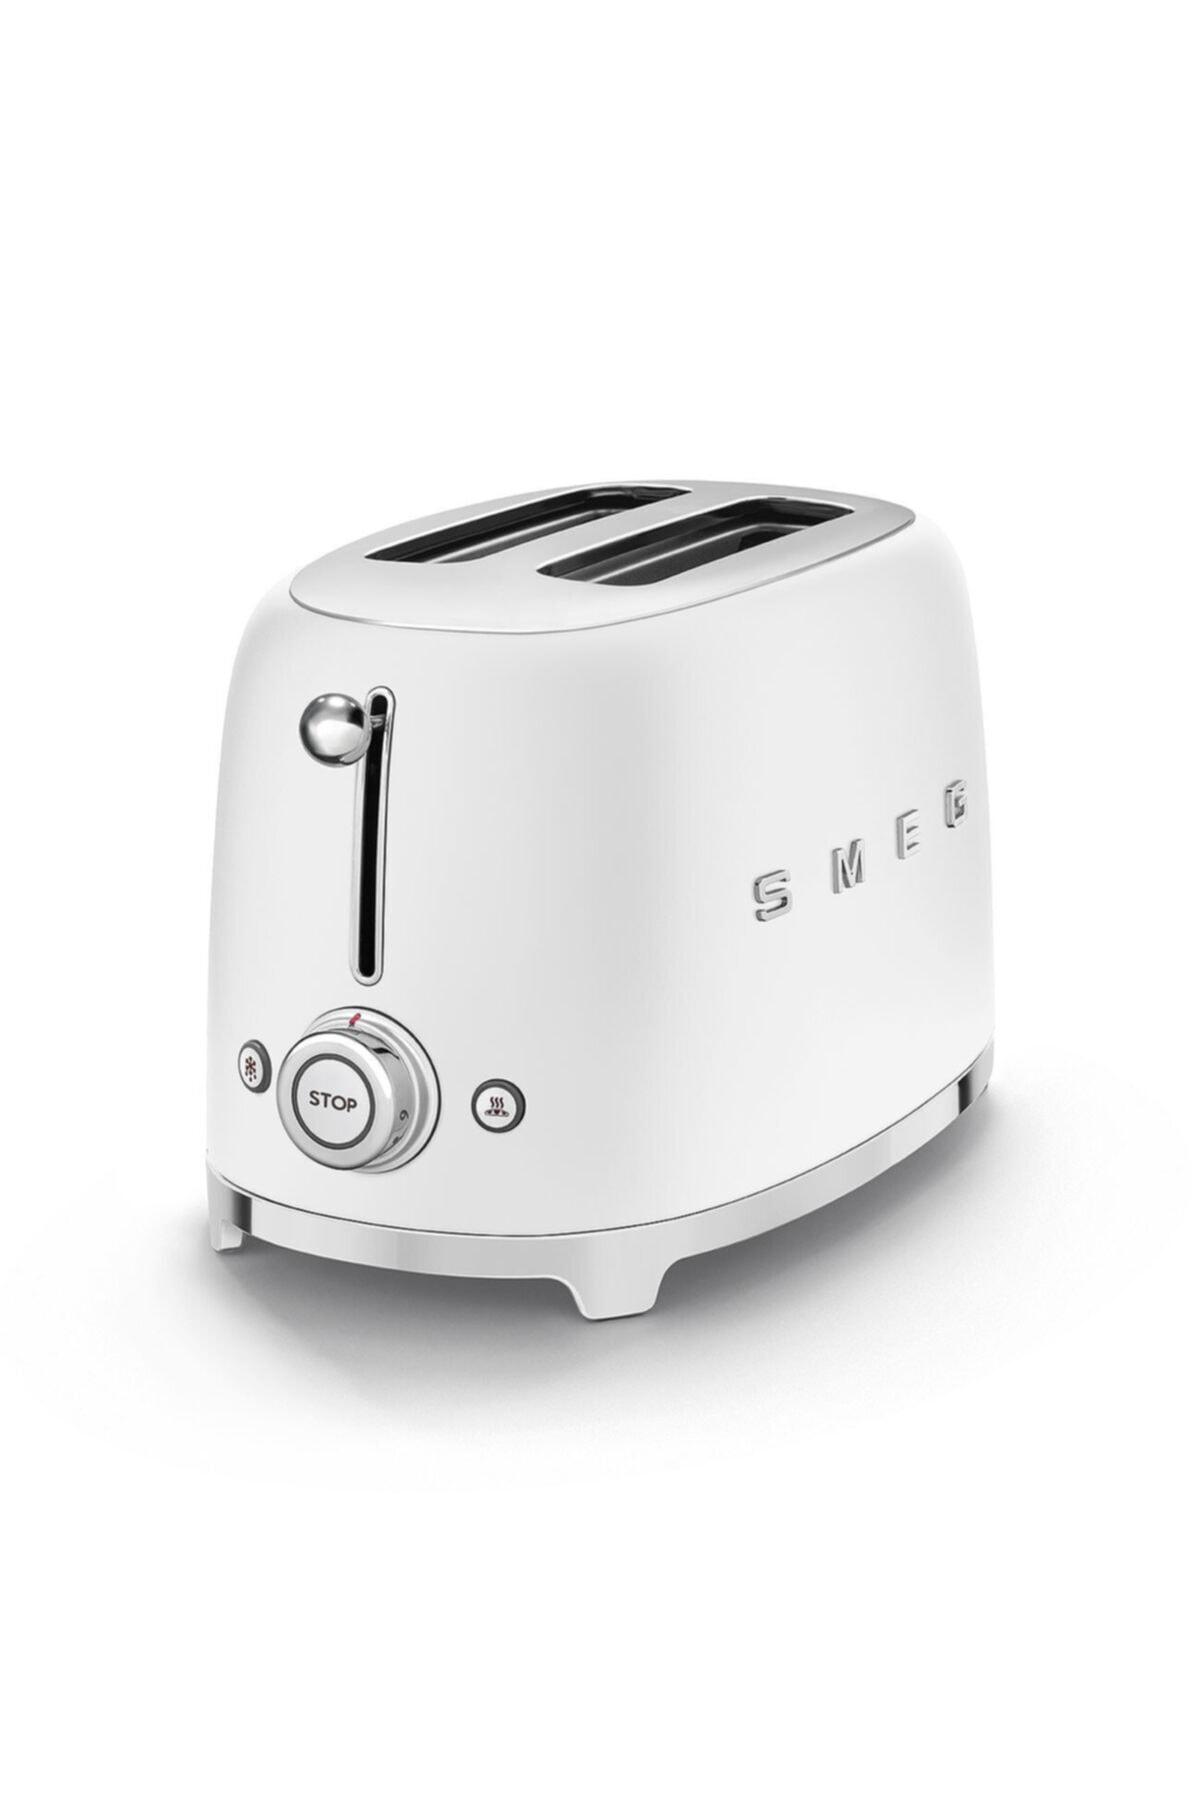 SMEG Mat Beyaz Retro 2x1 Ekmek Kızartma Makinesi 2